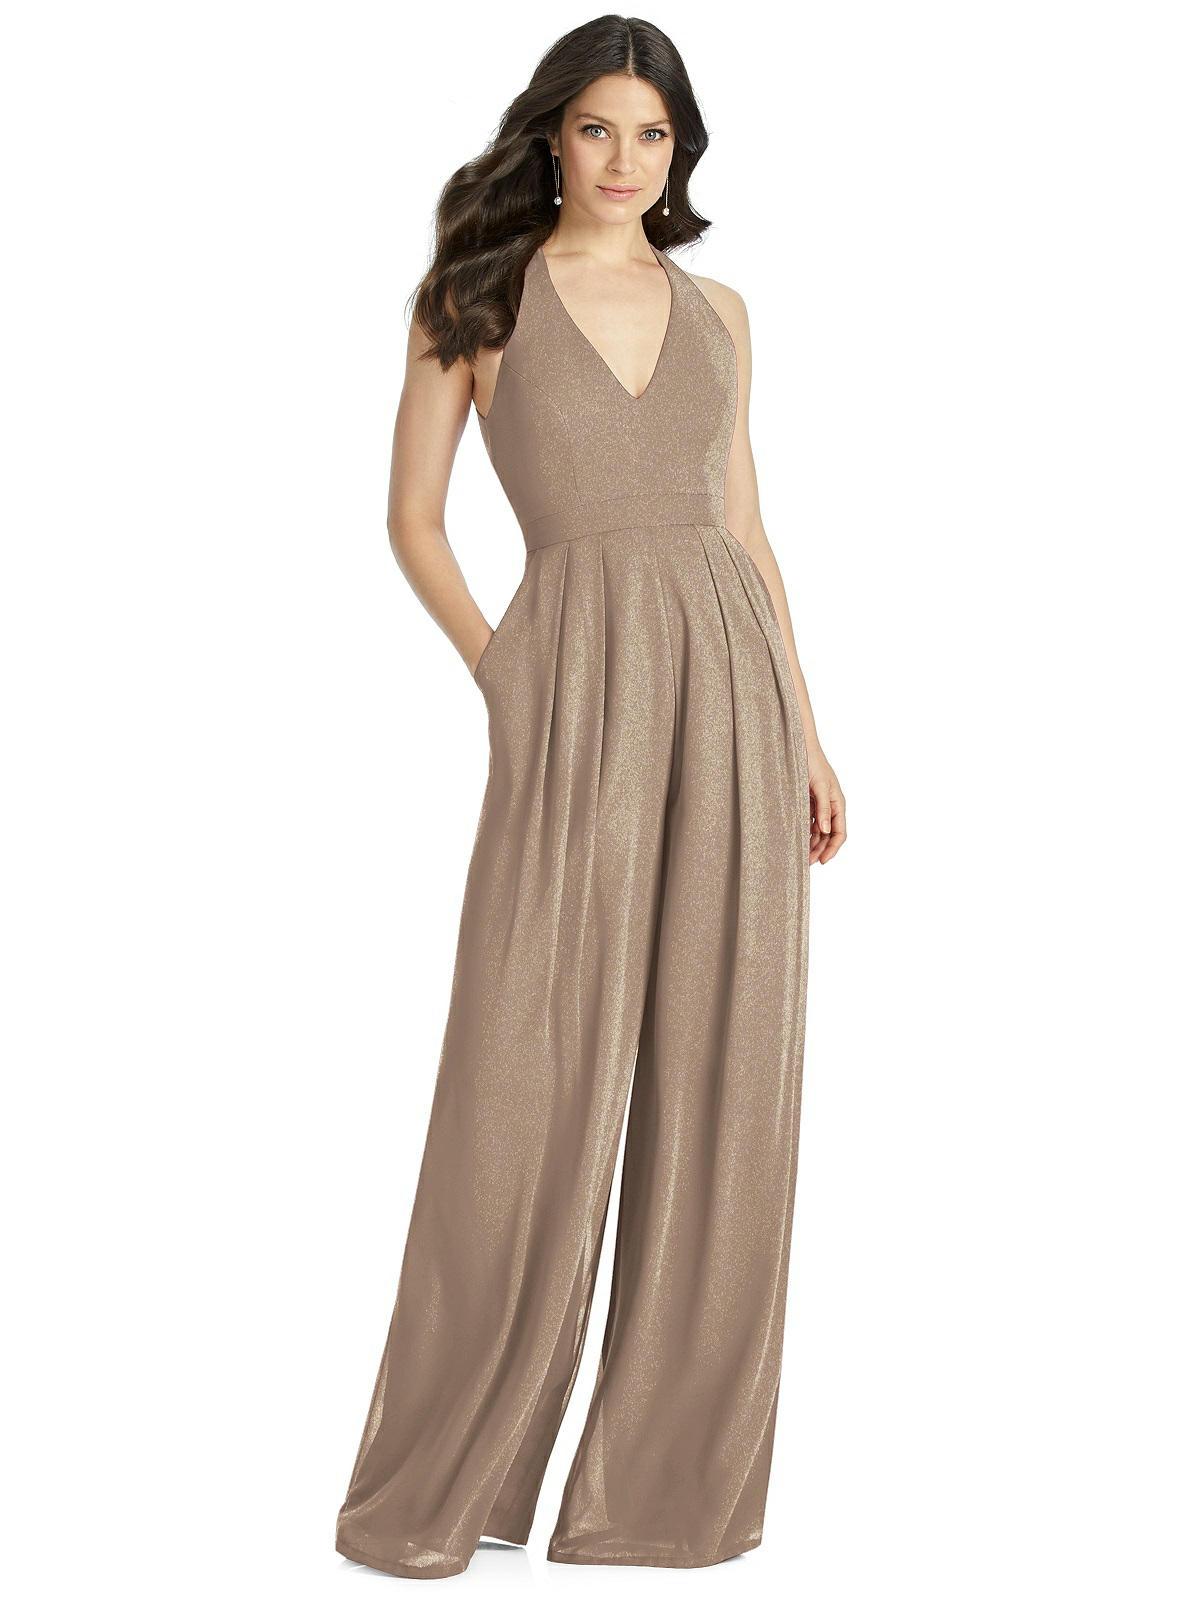 Dessy Shimmer Bridesmaid Jumpsuit Arielle LS #bridesmaidjumpsuits